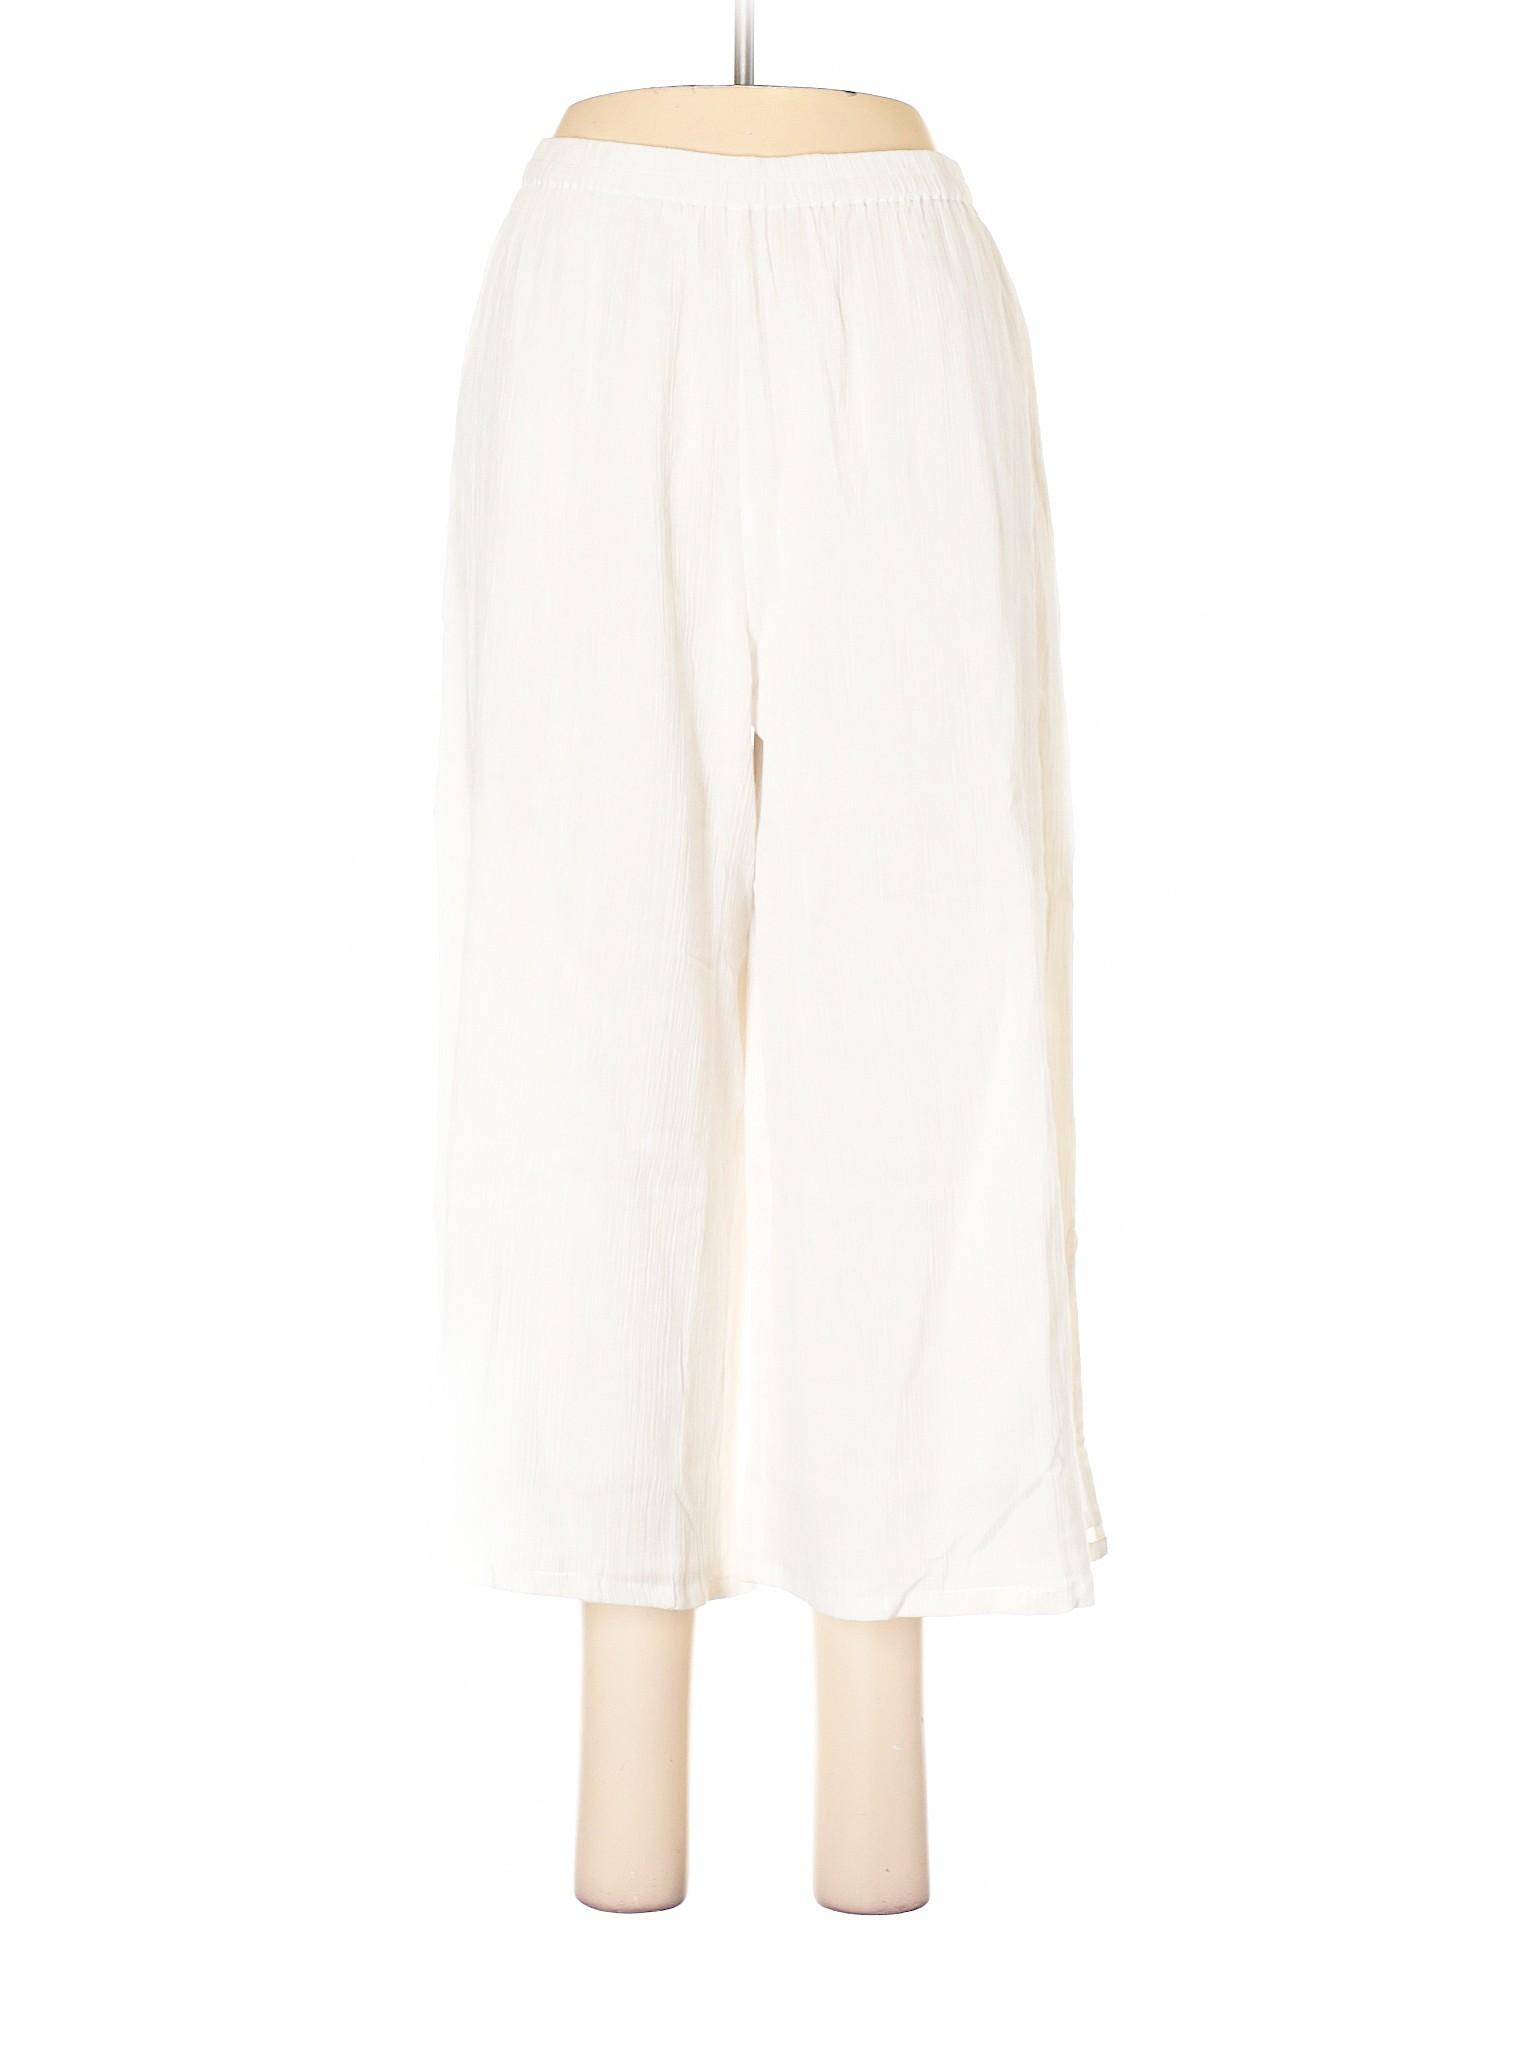 ASHRO Boutique winter ASHRO Casual Casual Boutique Pants Pants winter wAUFq6A7Y